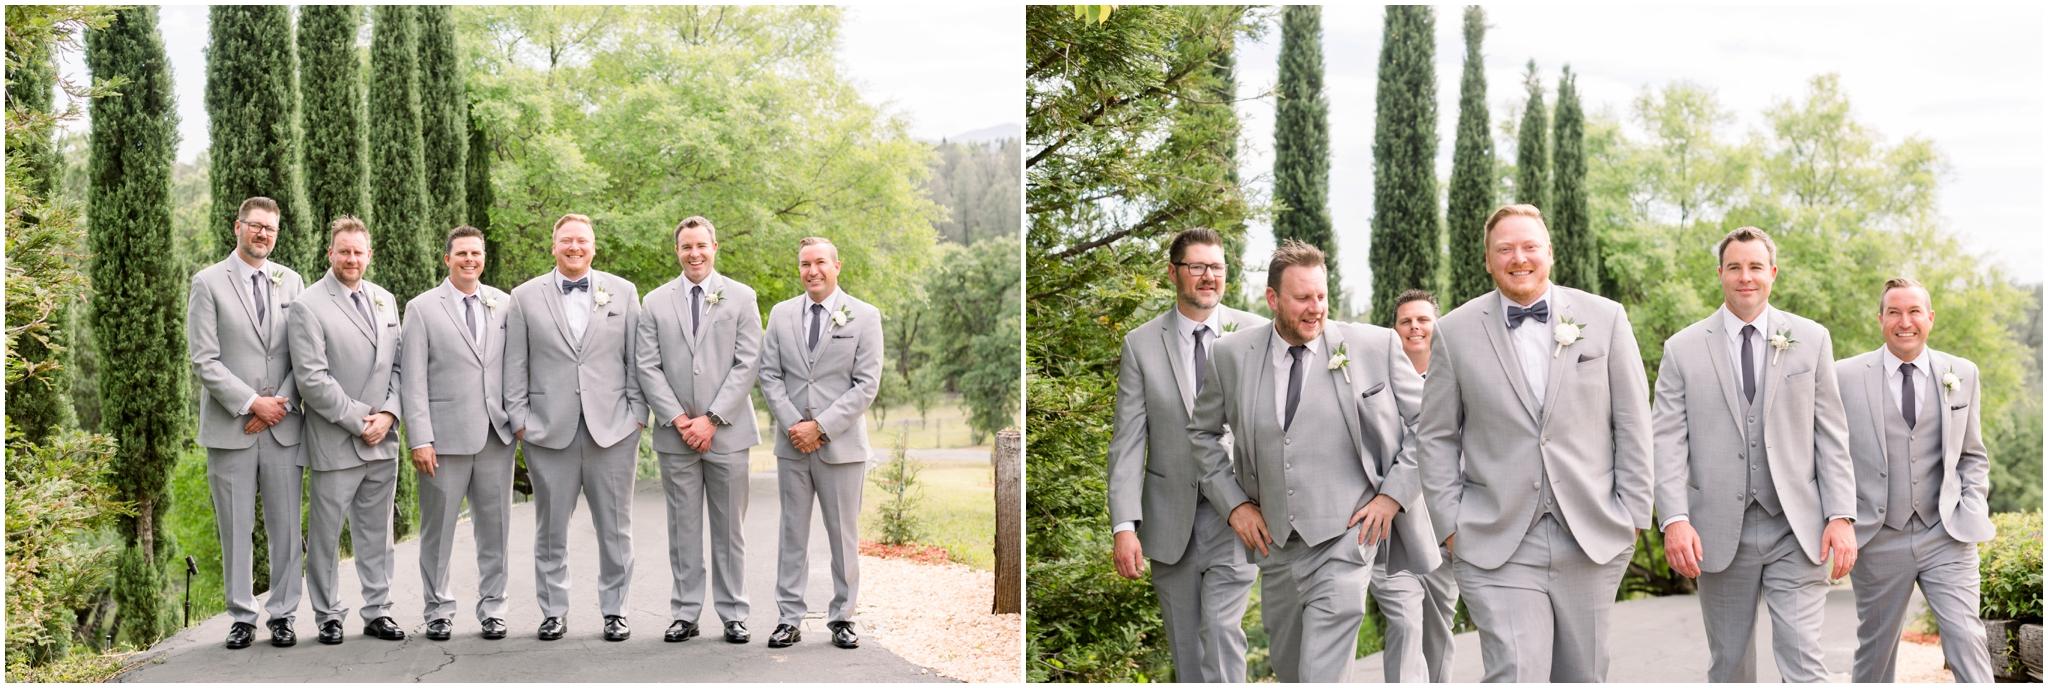 cindy_joseph_wedding_redding_blog_0017.jpg